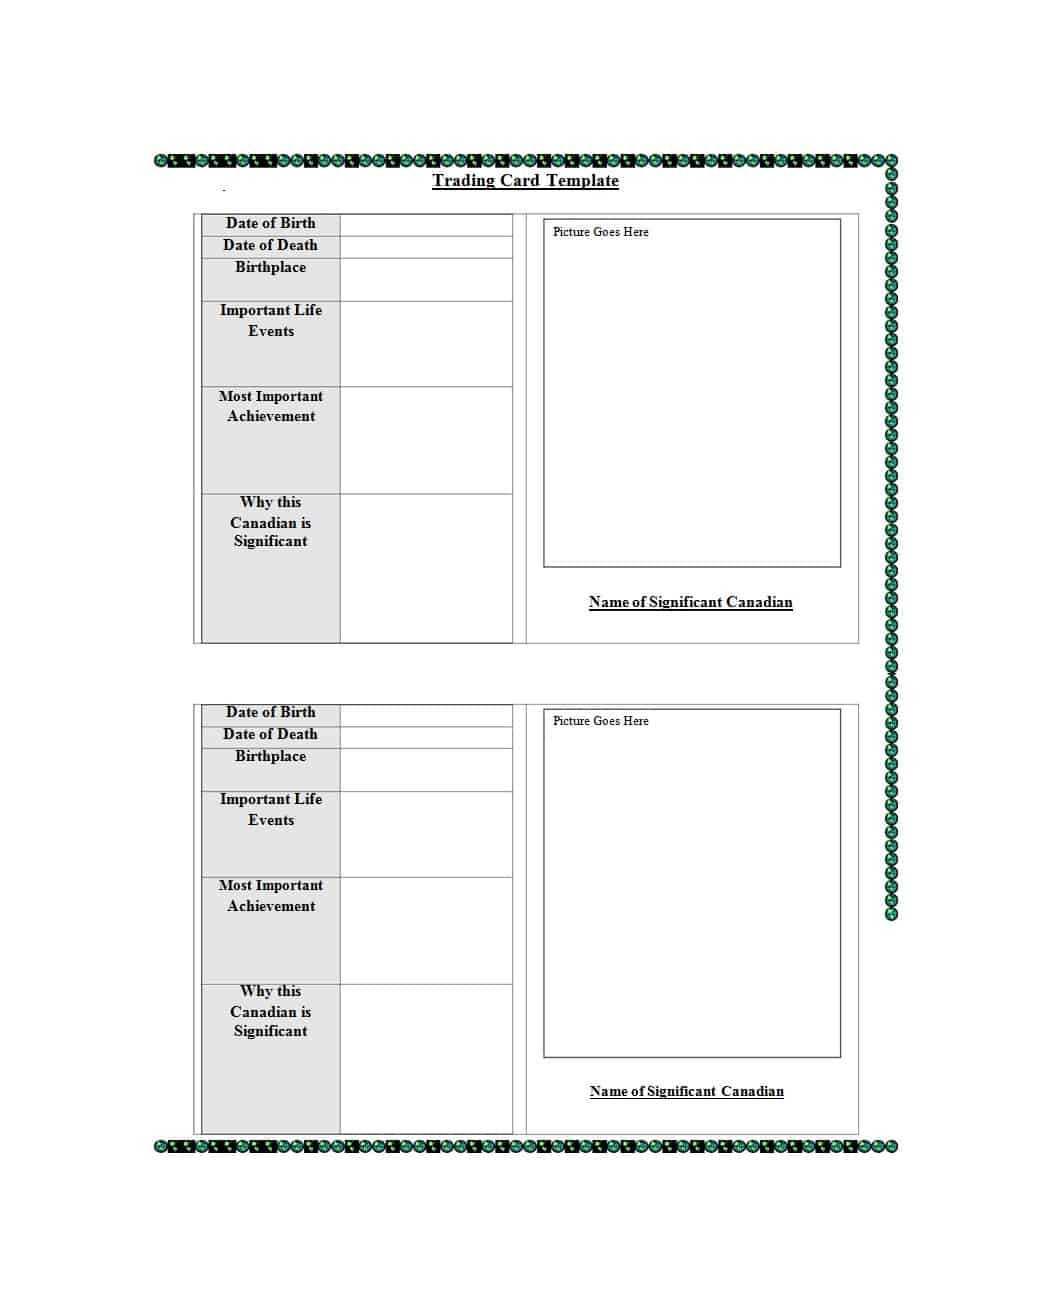 33 Free Trading Card Templates (Baseball, Football, Etc With Regard To Free Trading Card Template Download